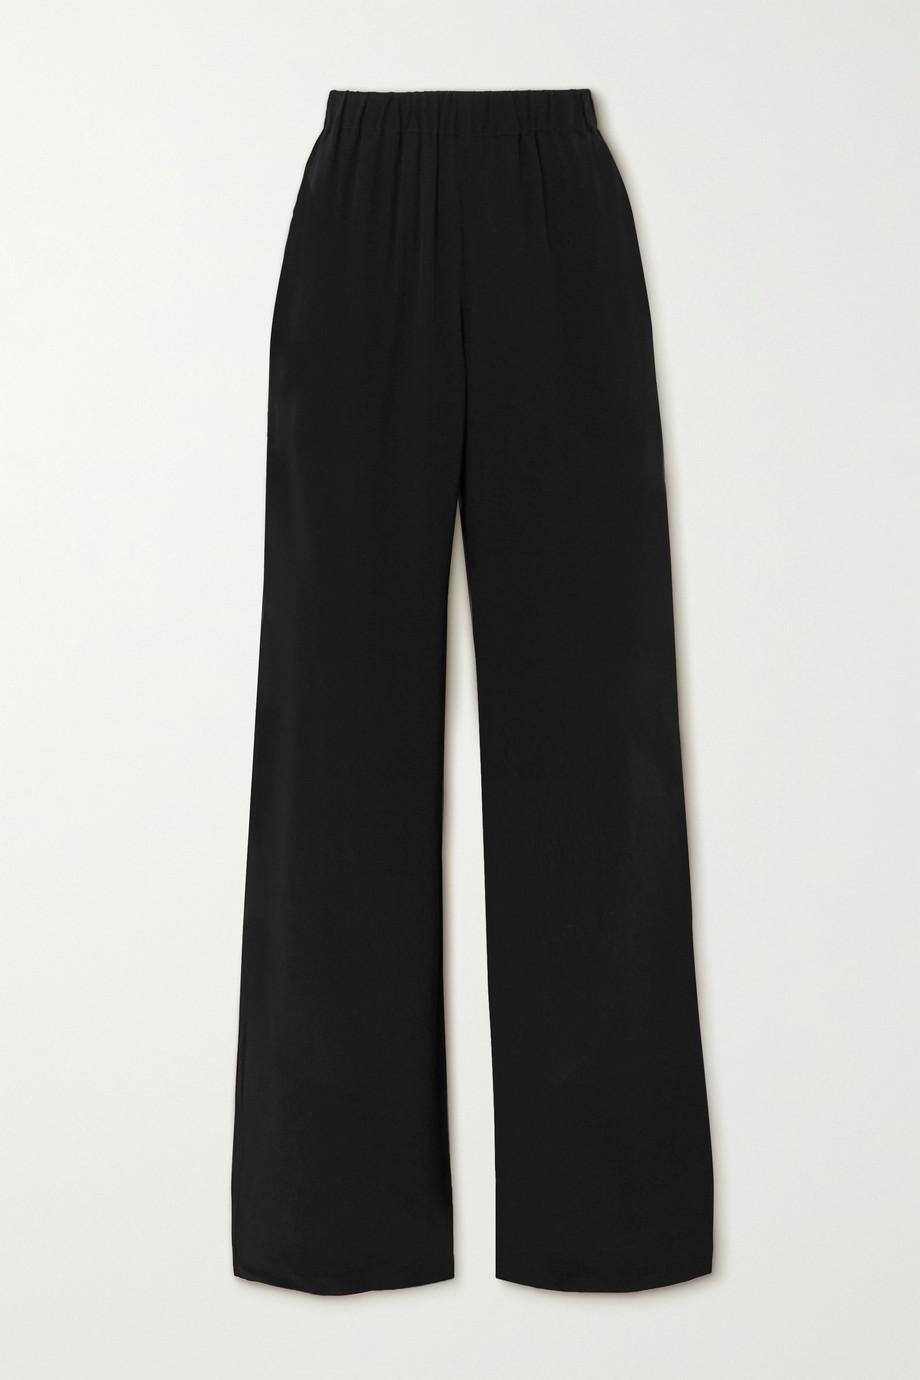 Envelope1976 Vehi silk-crepe trousers